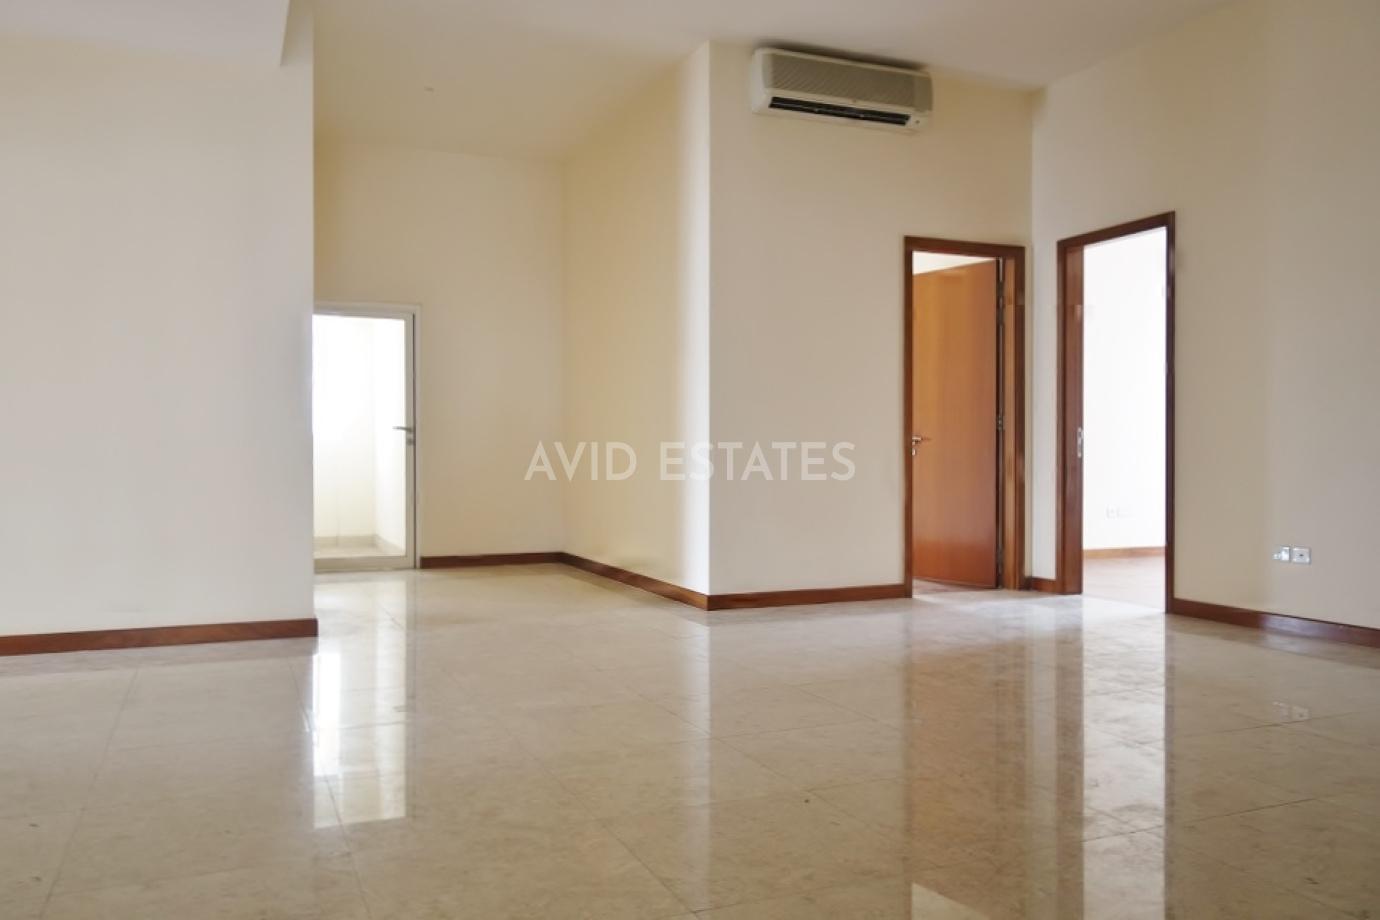 Hijauan Kiara, Mont Kiara,Kuala Lumpur, ,5 BathroomsBathrooms,Condominium / Serviced Residence,For Sale,1099